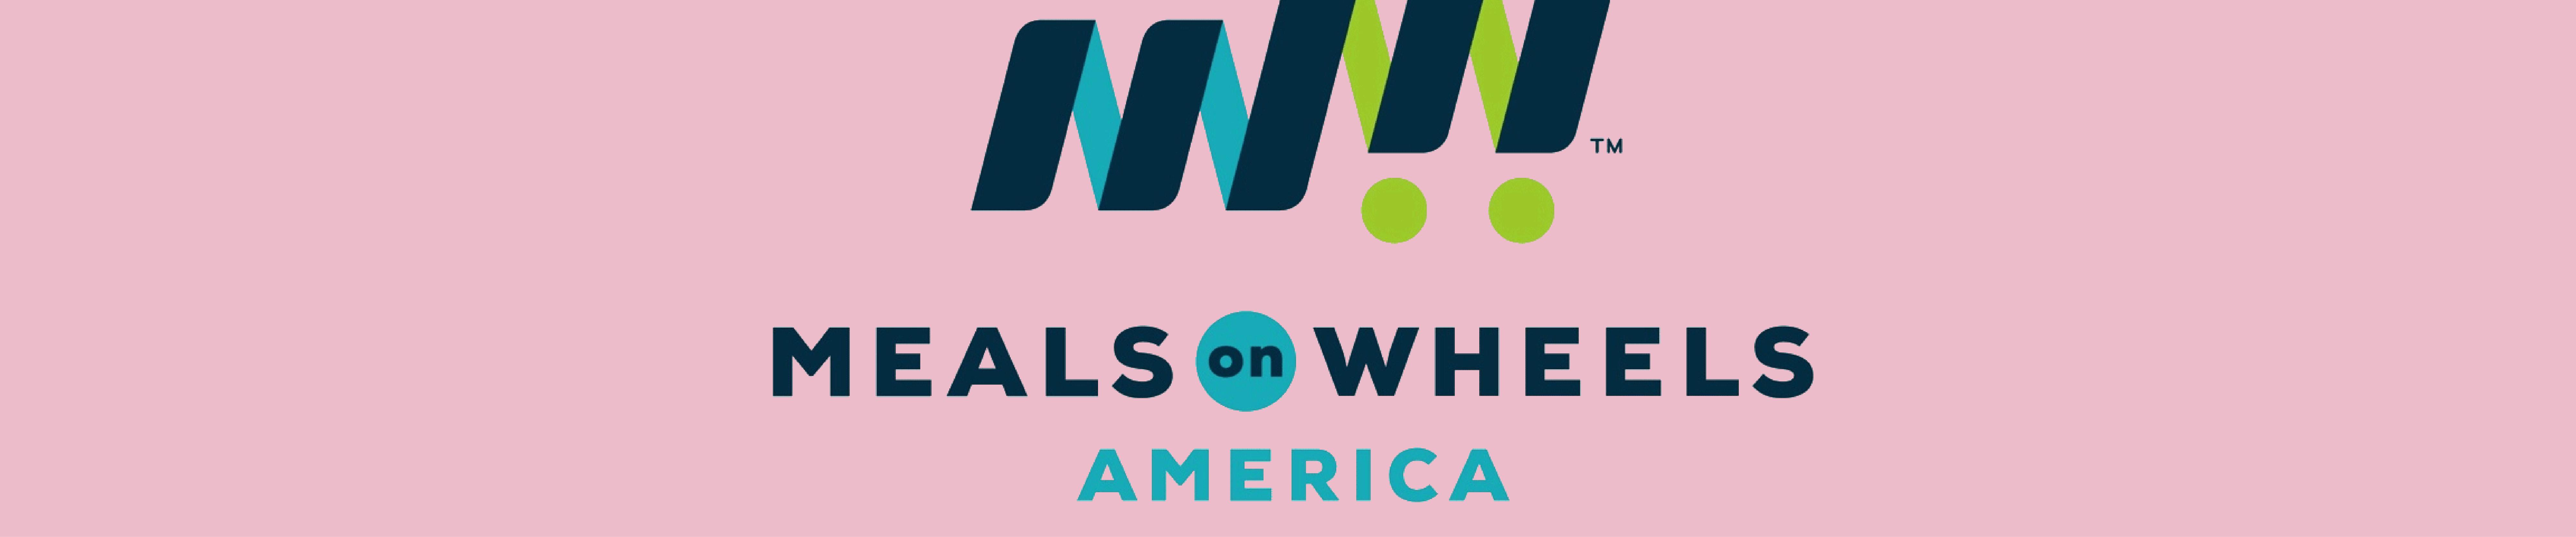 Meals on Wheels Banner Logo